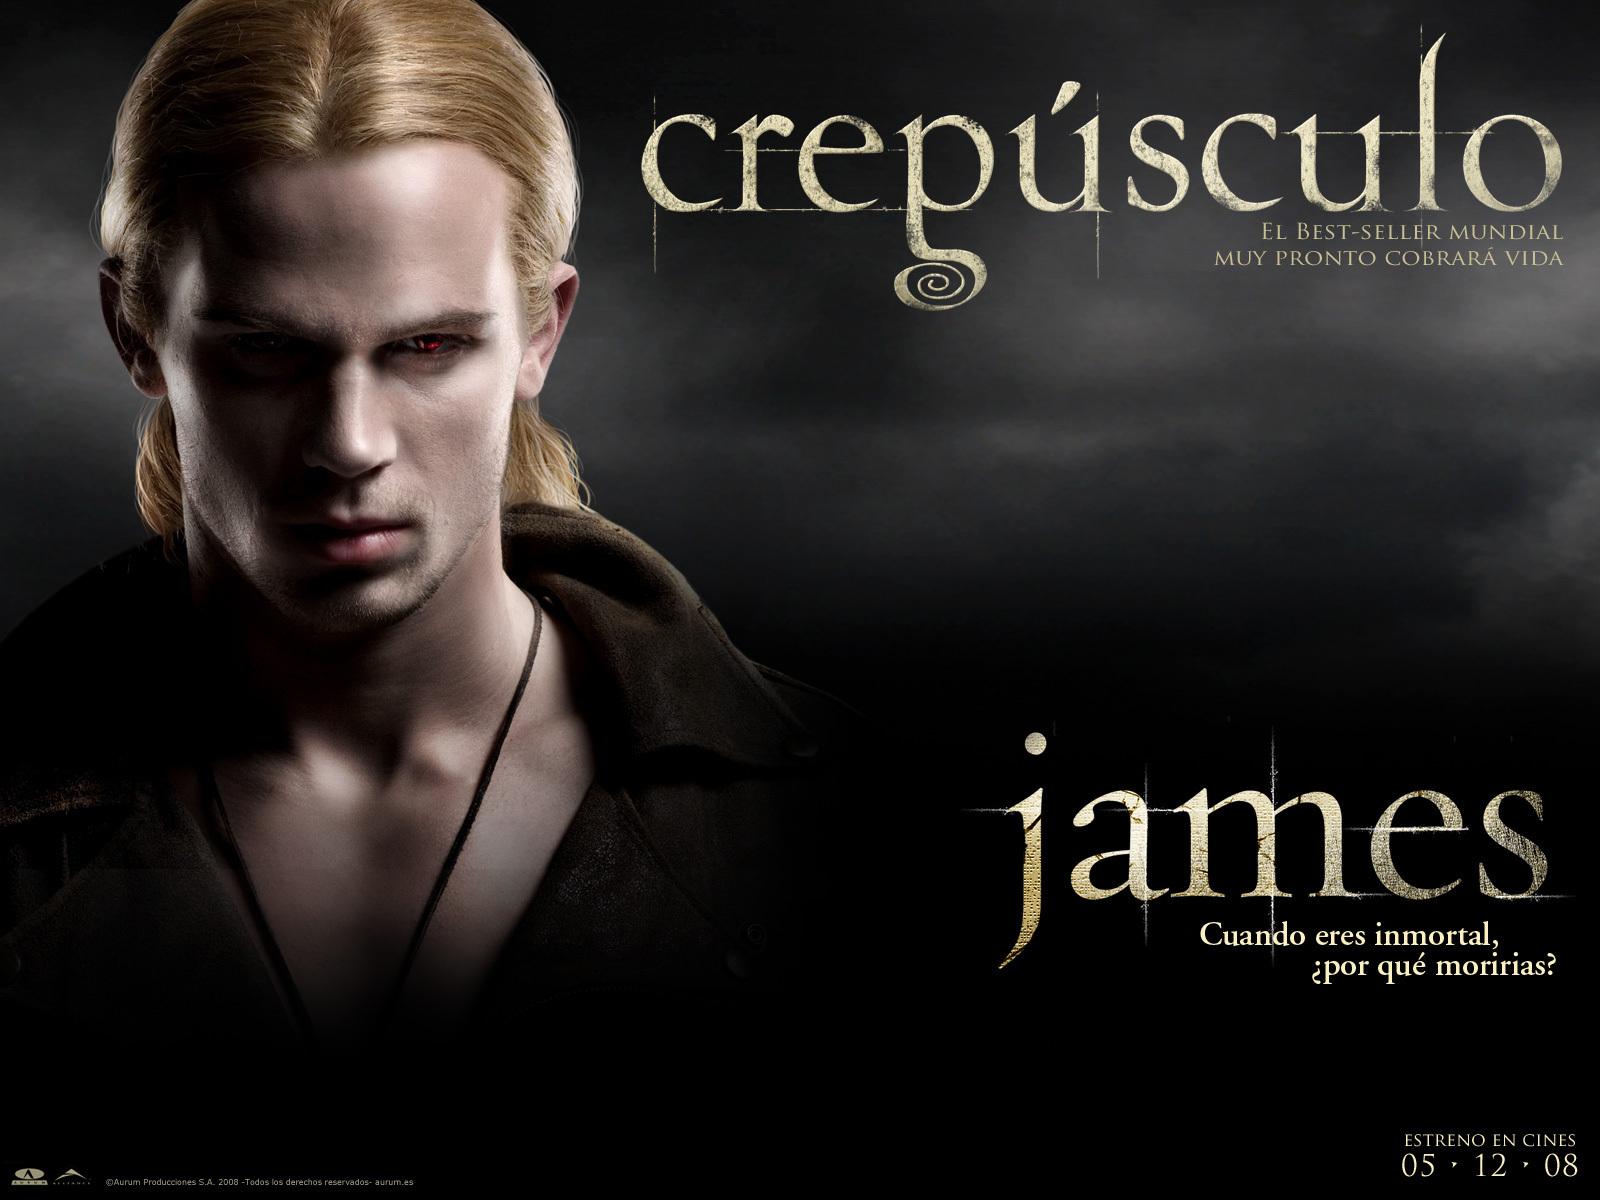 Crepusculo amanecer parte 2 trailer latino dating 9